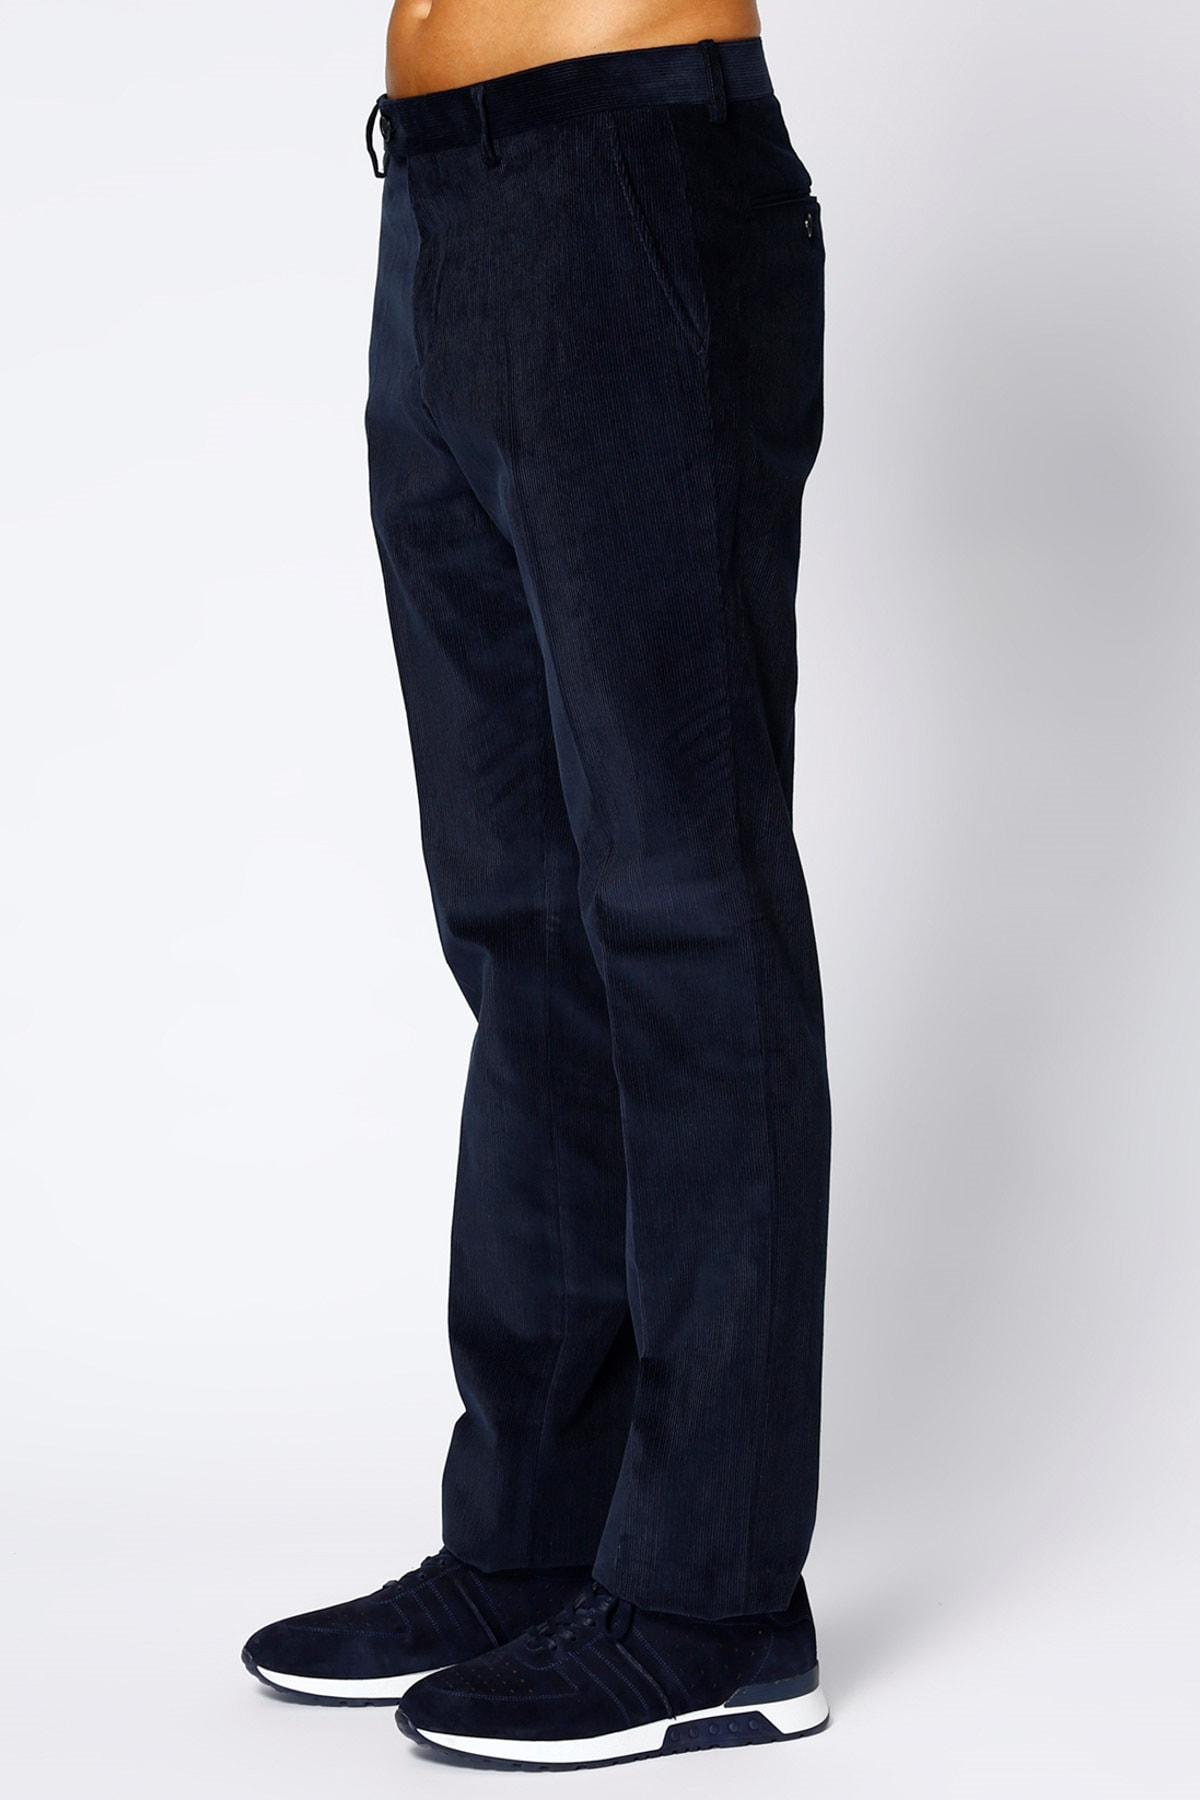 Cotton Bar Erkek Lacivert Pantolon 502953515 / Boyner 2